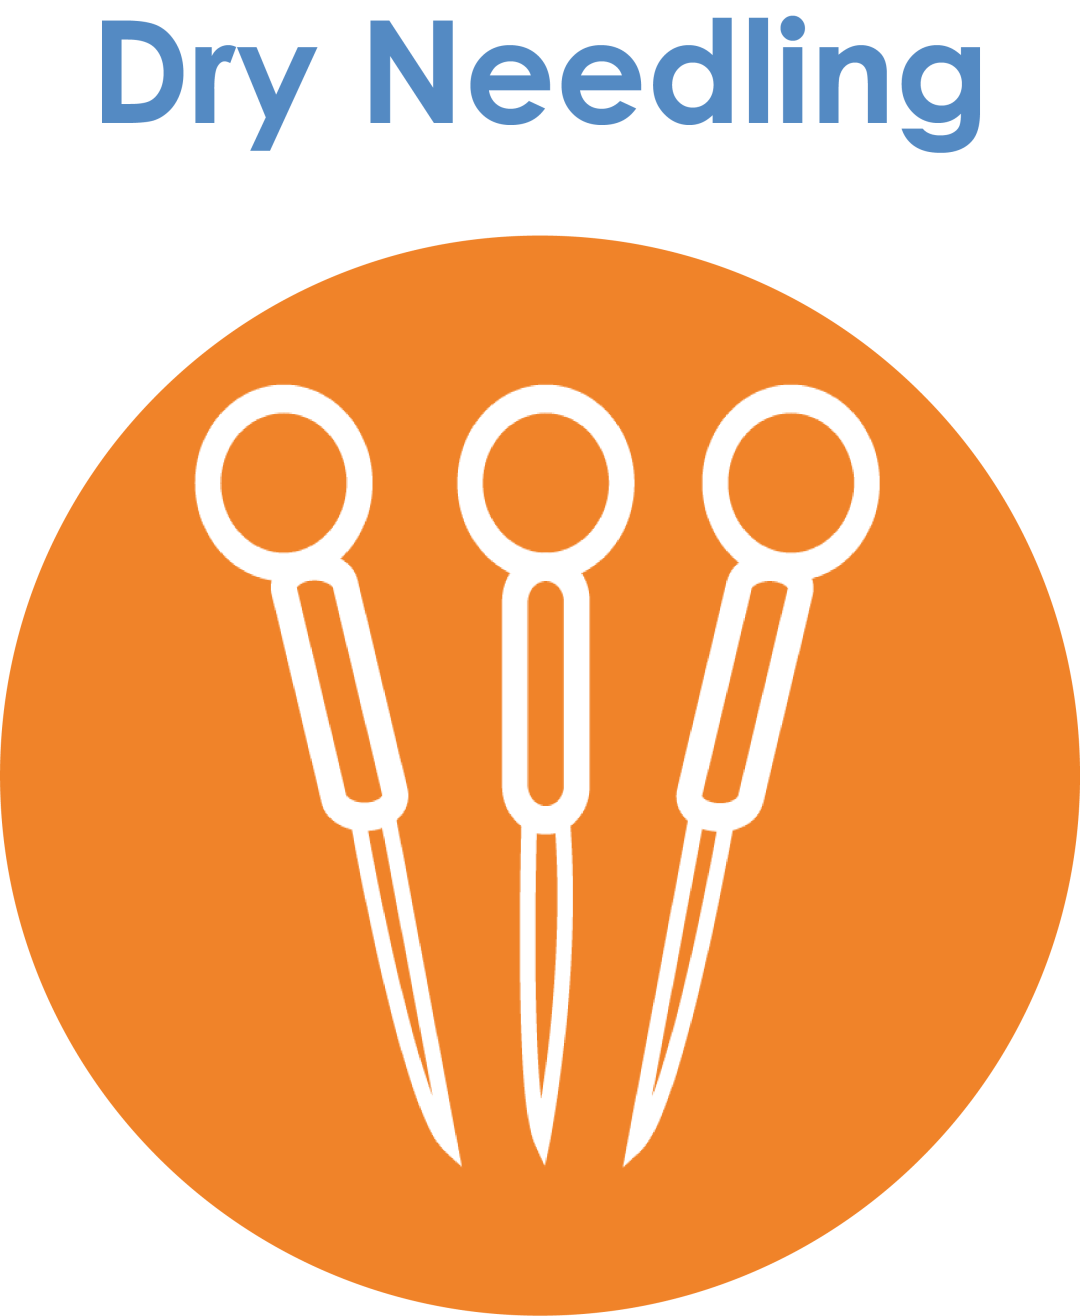 Dry Needling fysio 4 den bosch